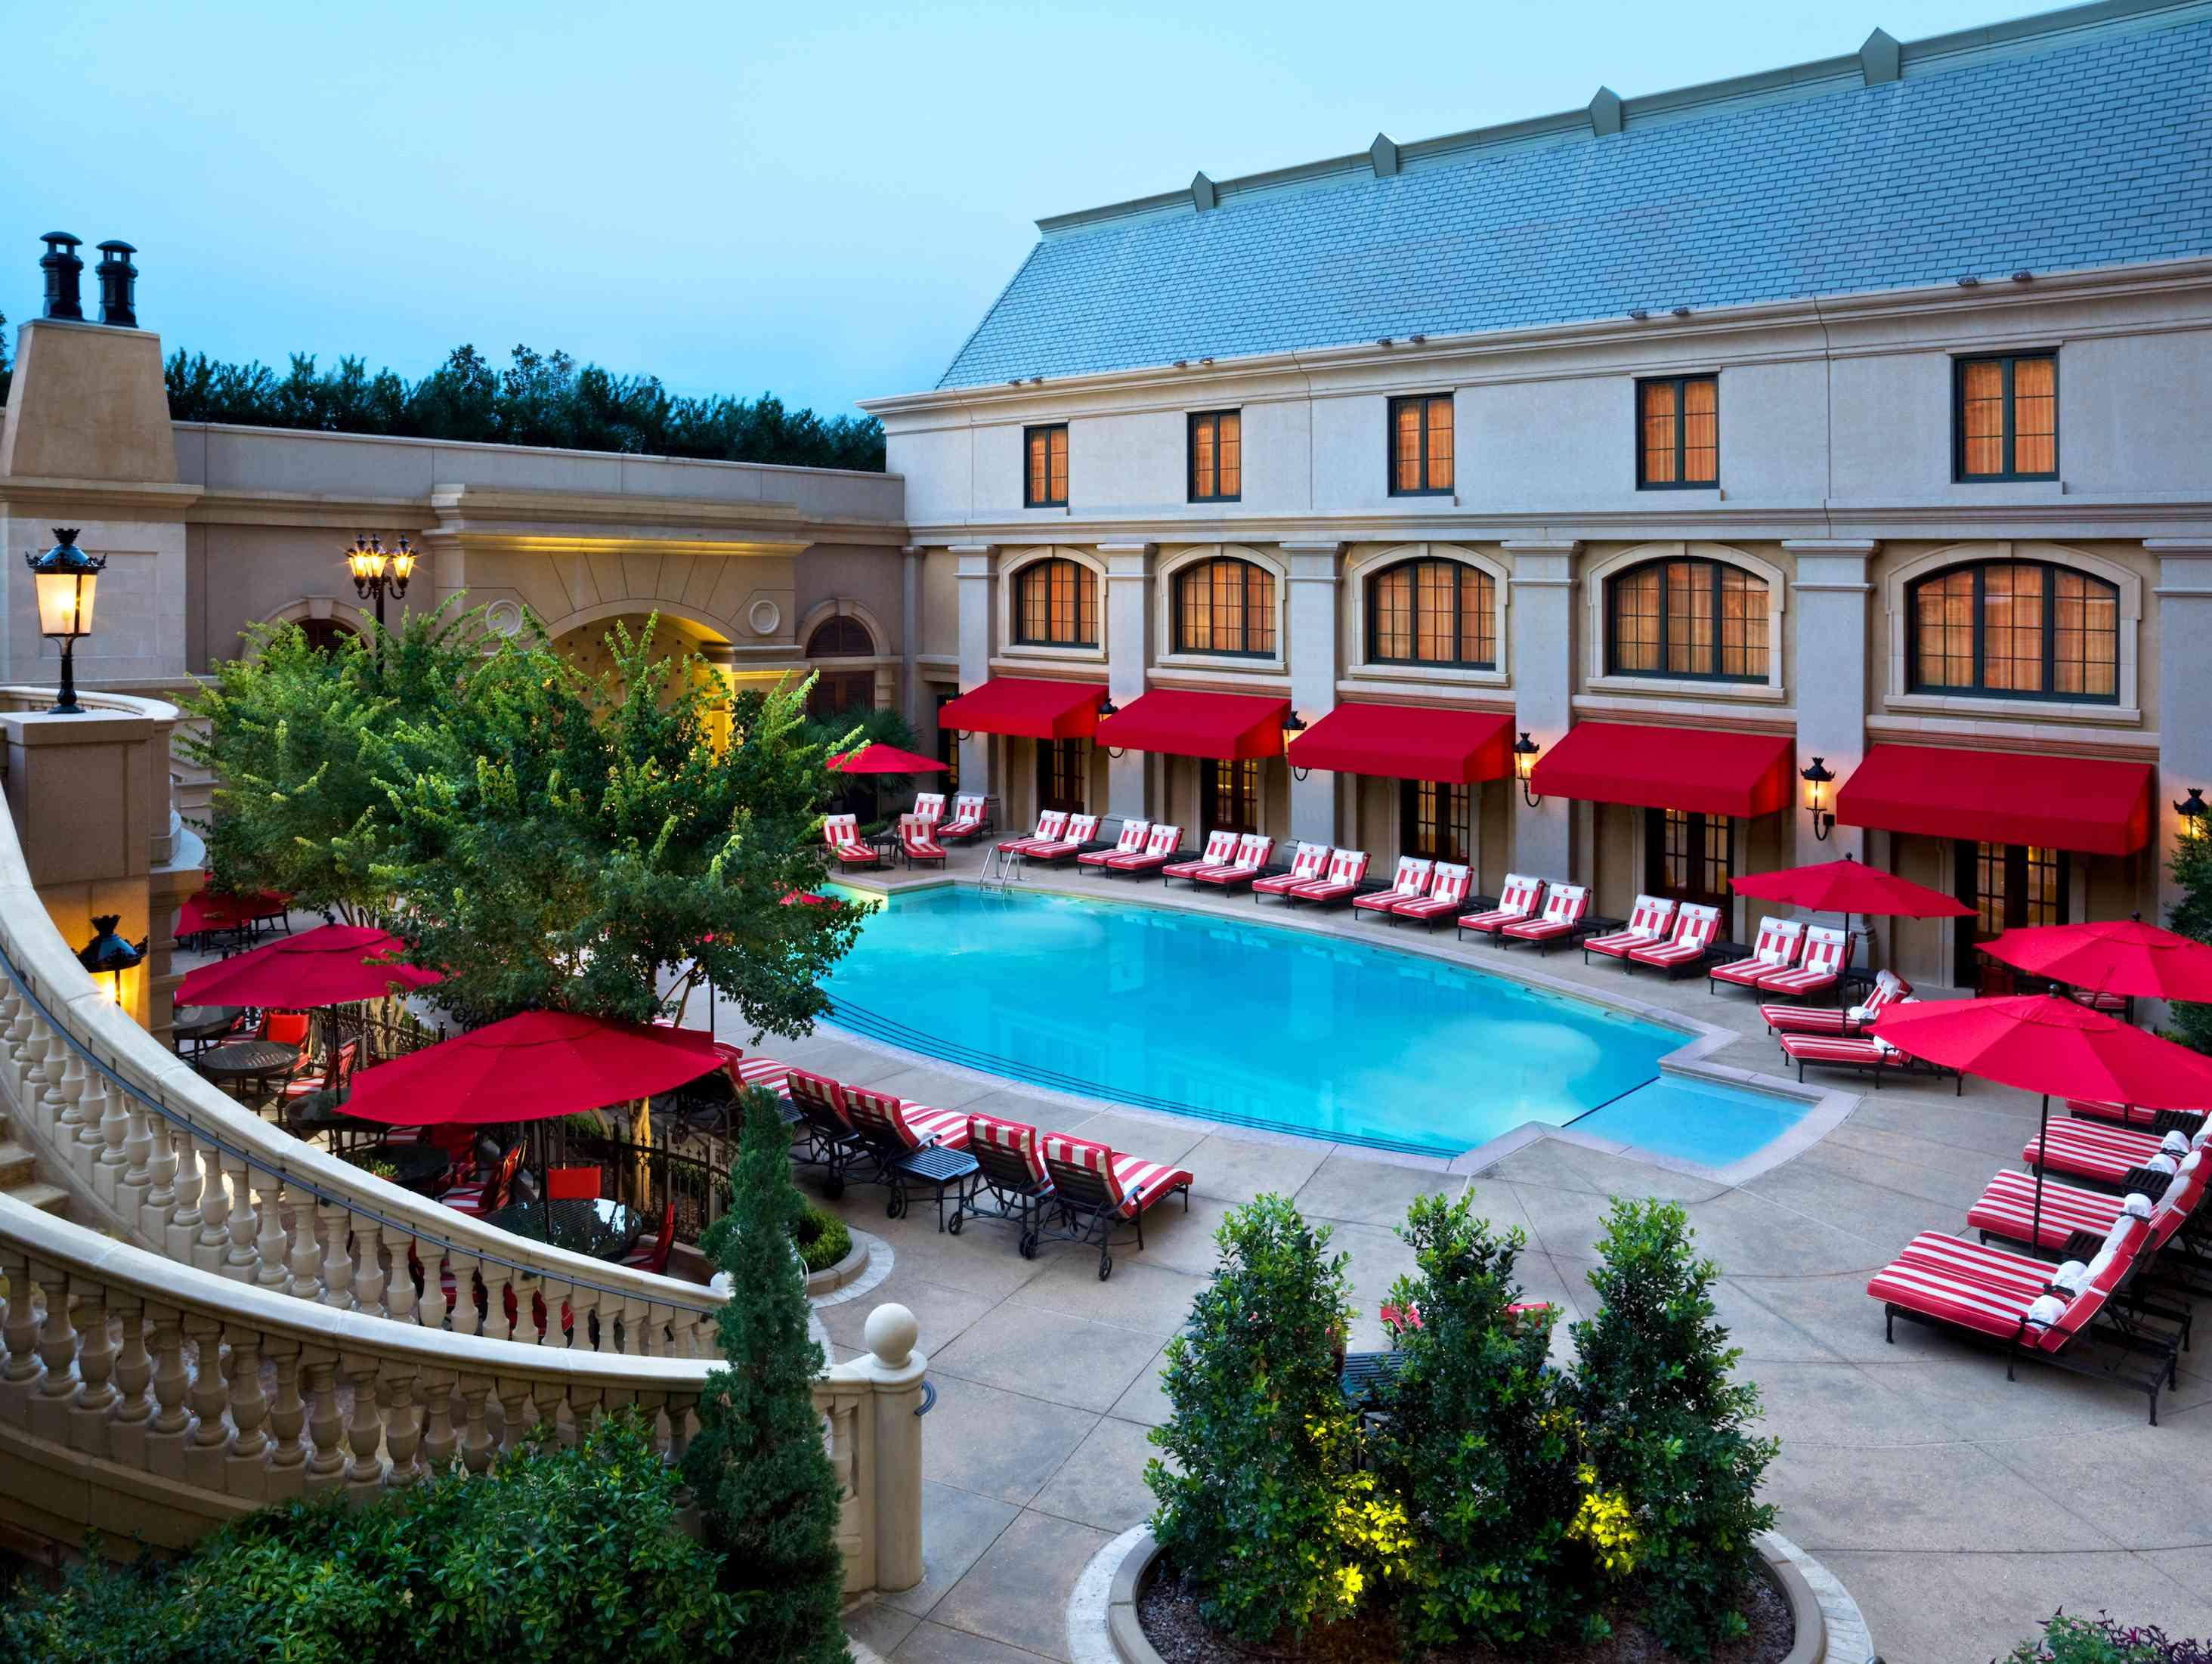 St. Regis Atlanta pool area